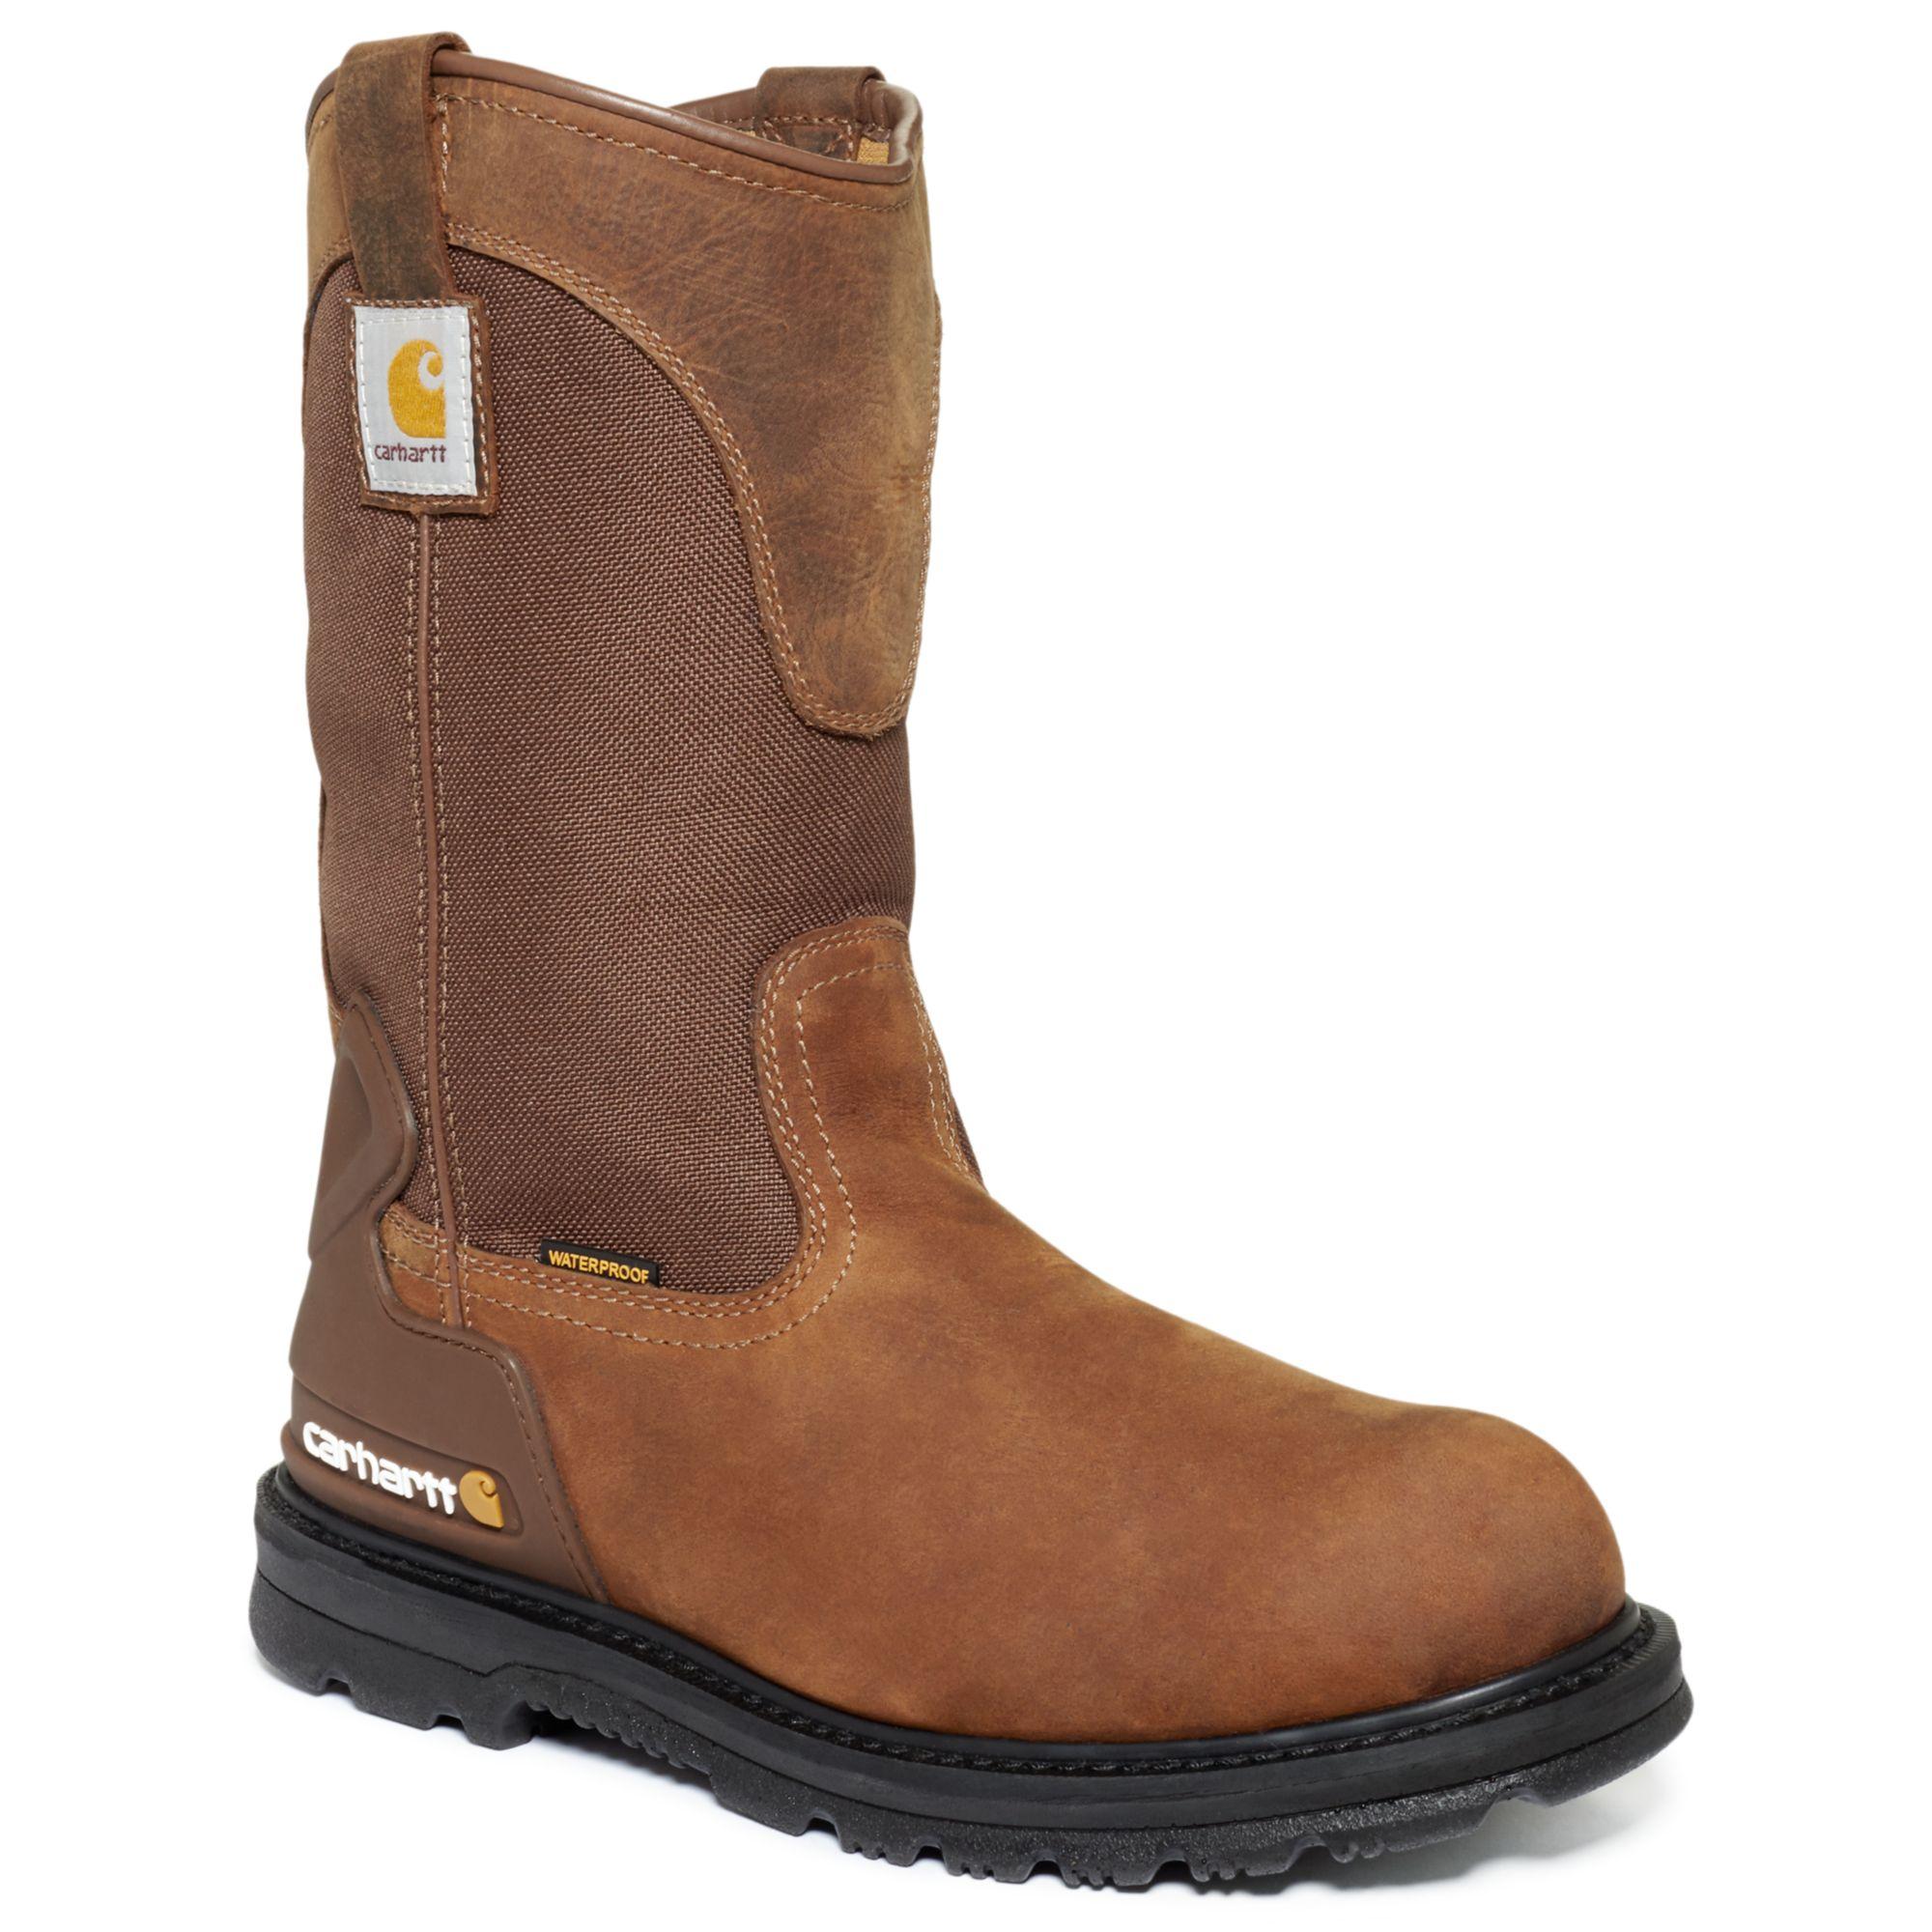 carhartt 11 inch bison waterproof work boots in brown for